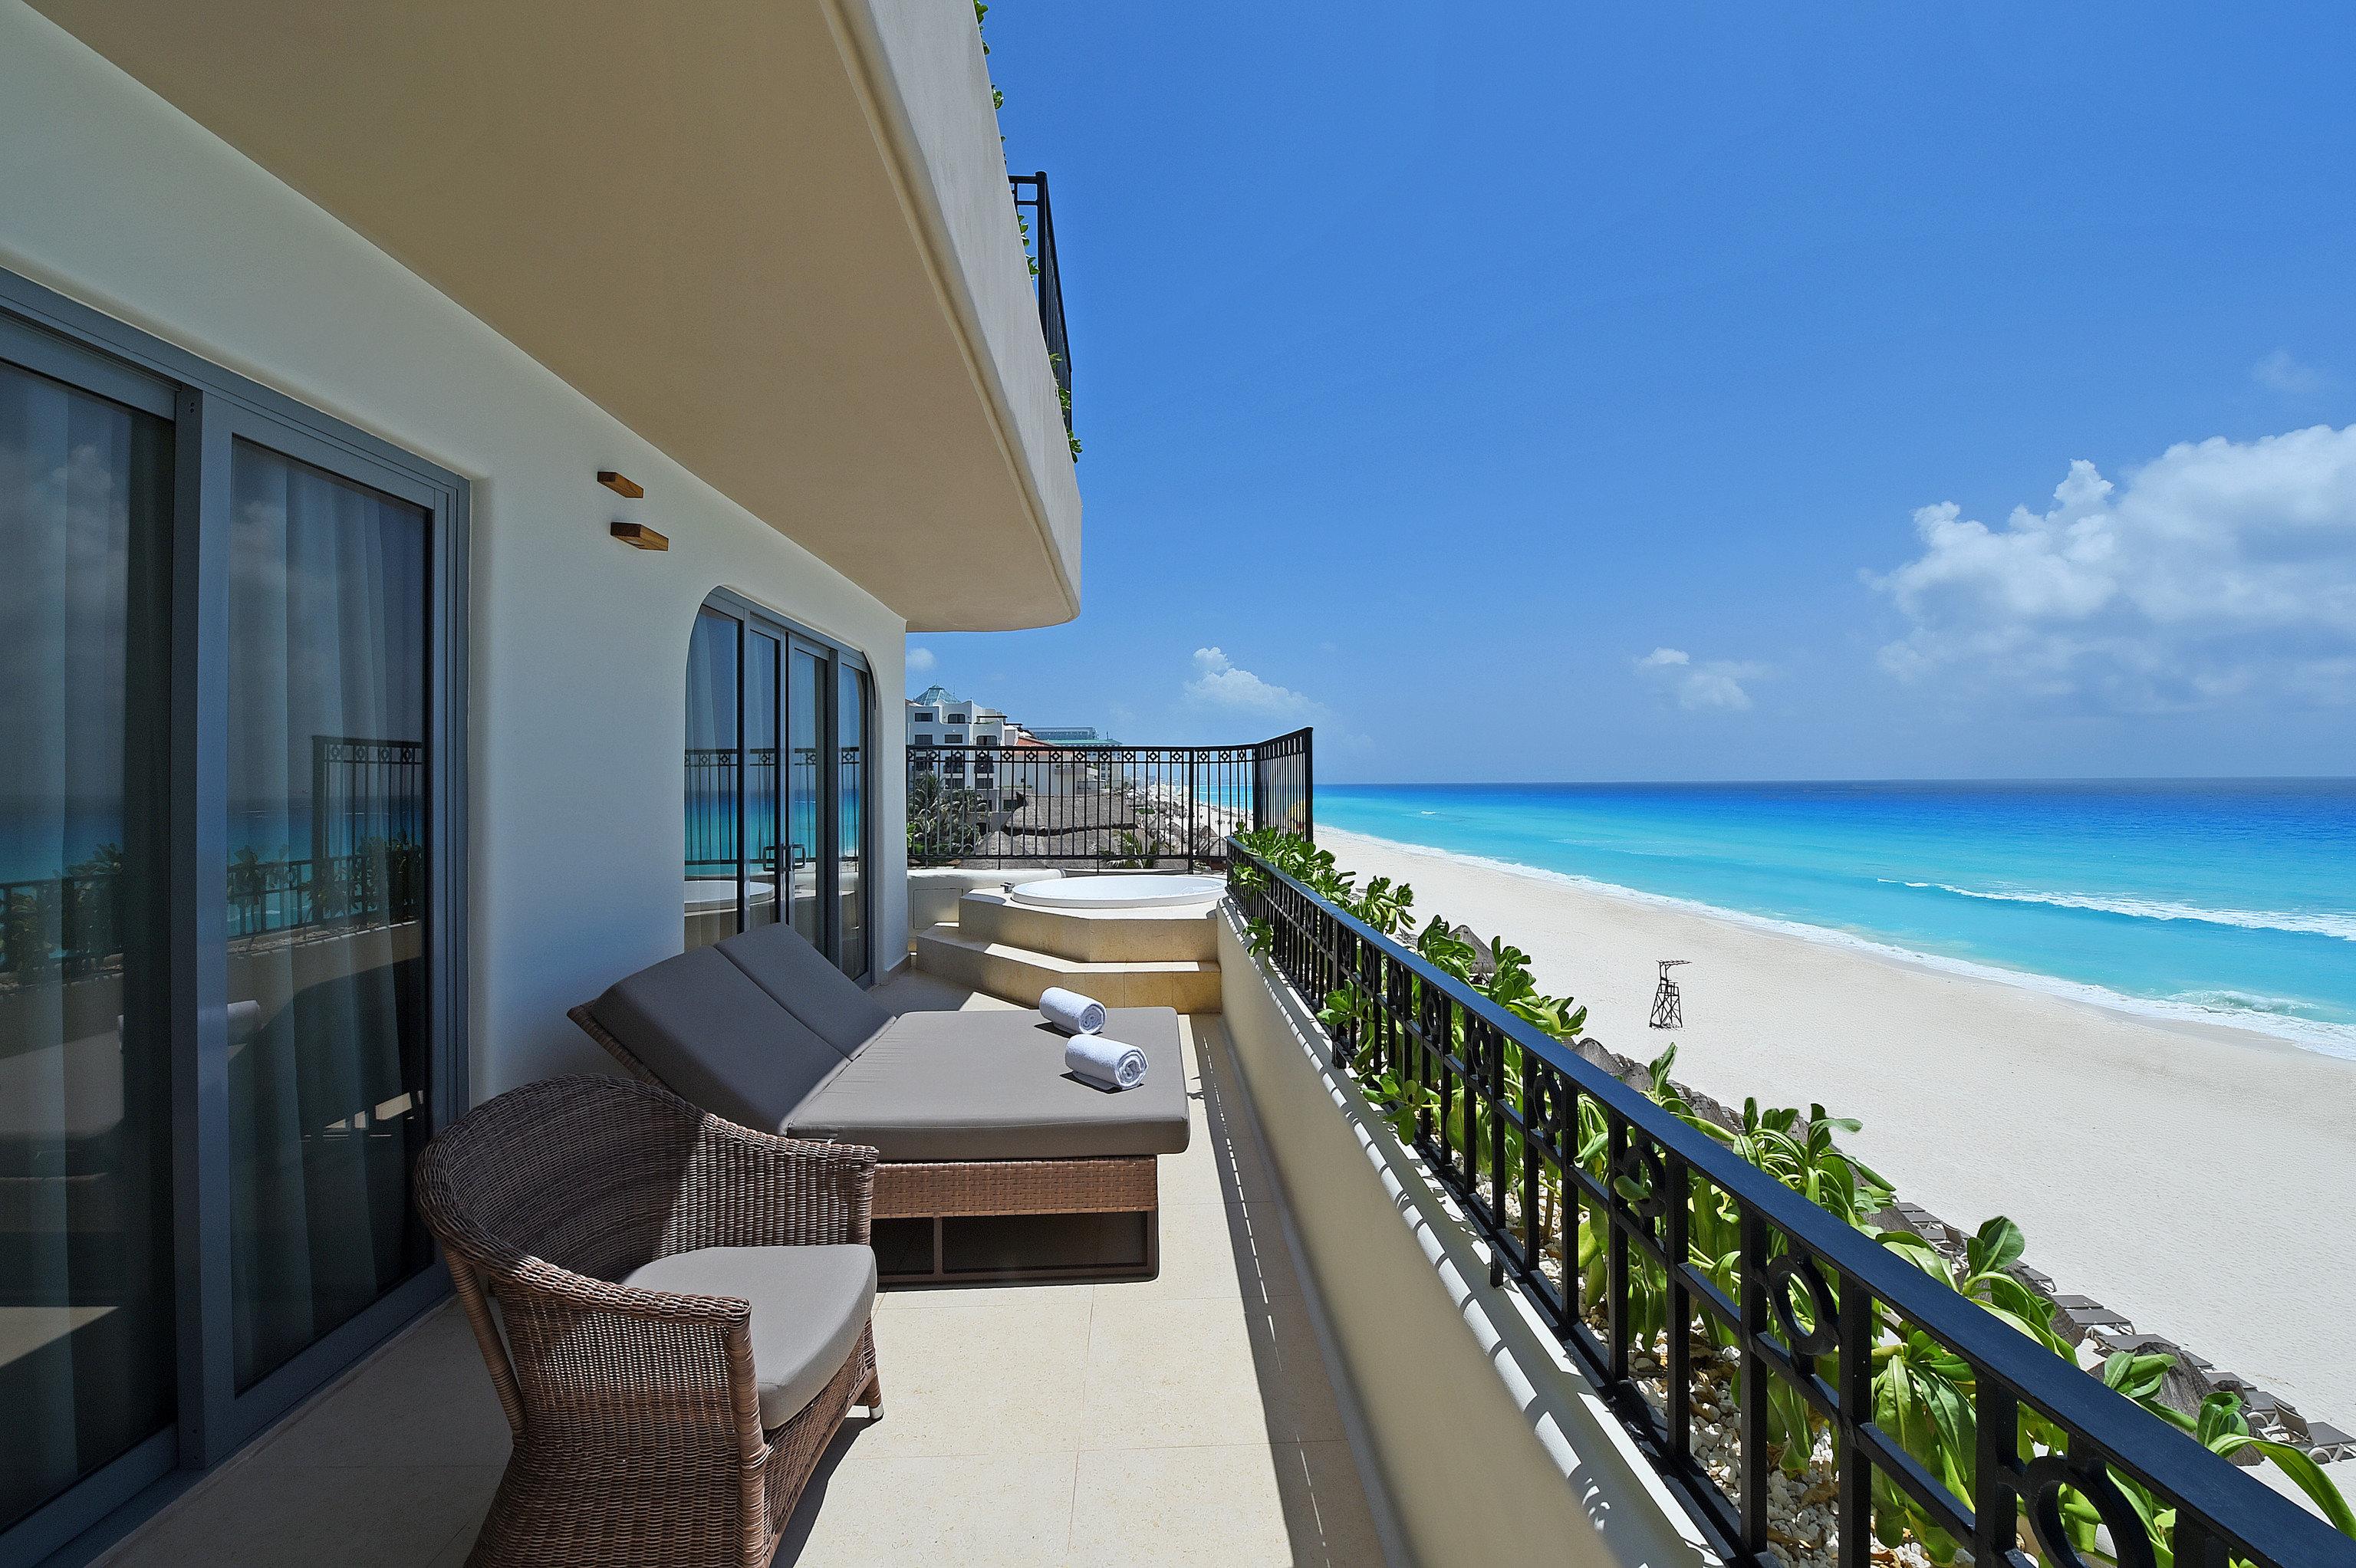 sky property Resort Sea condominium Balcony Villa Ocean penthouse apartment house Beach shore overlooking